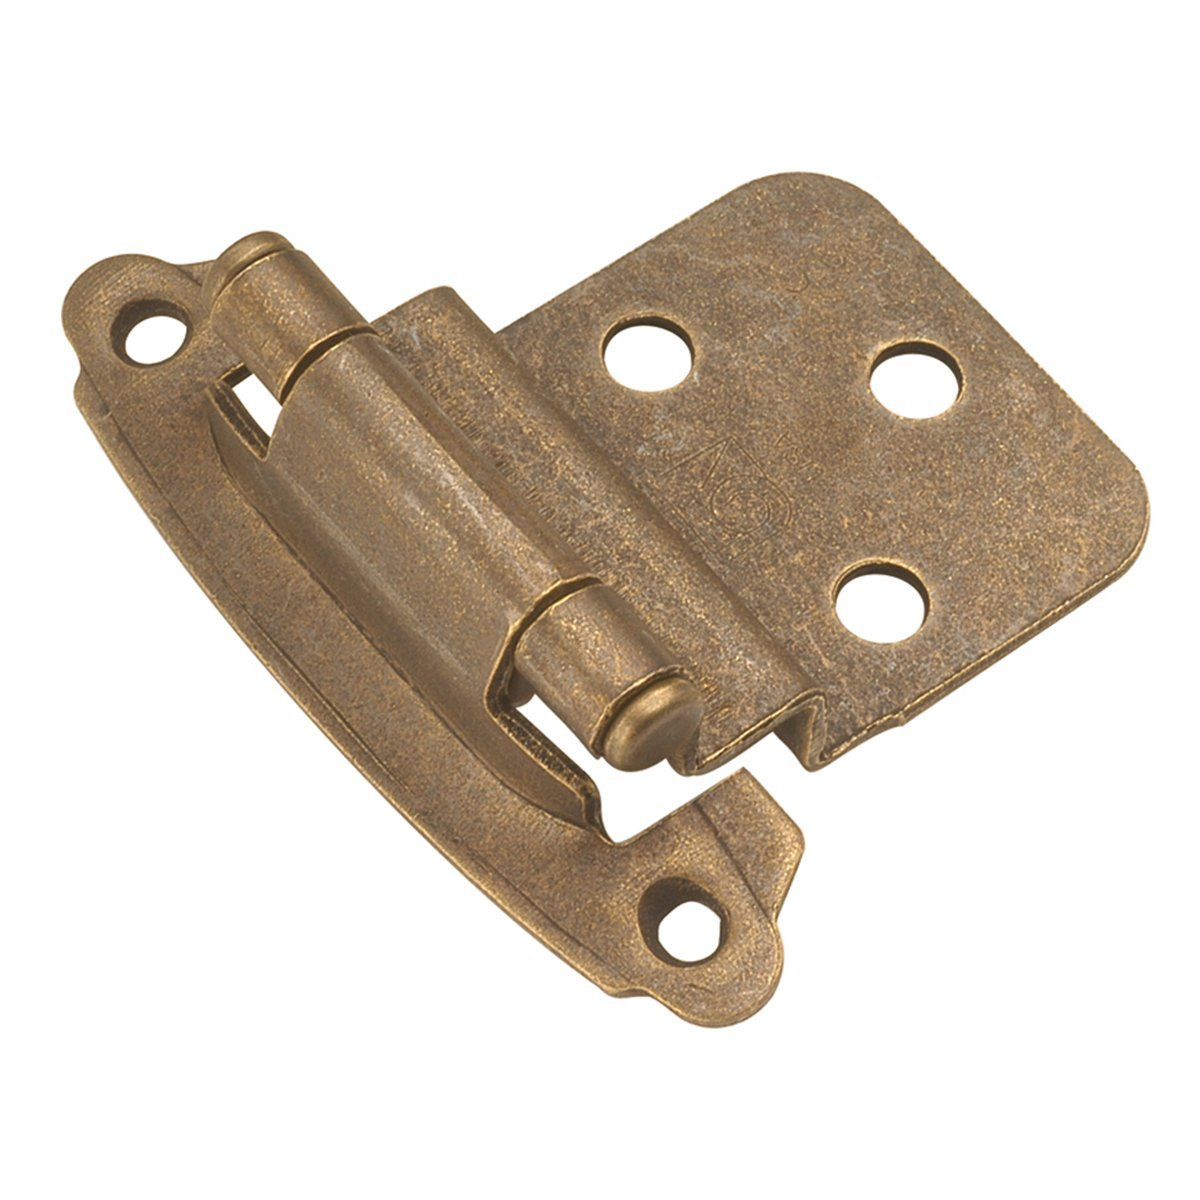 Hickory Hardware Windover Antique Brass Hinges | prodigalpieces.com